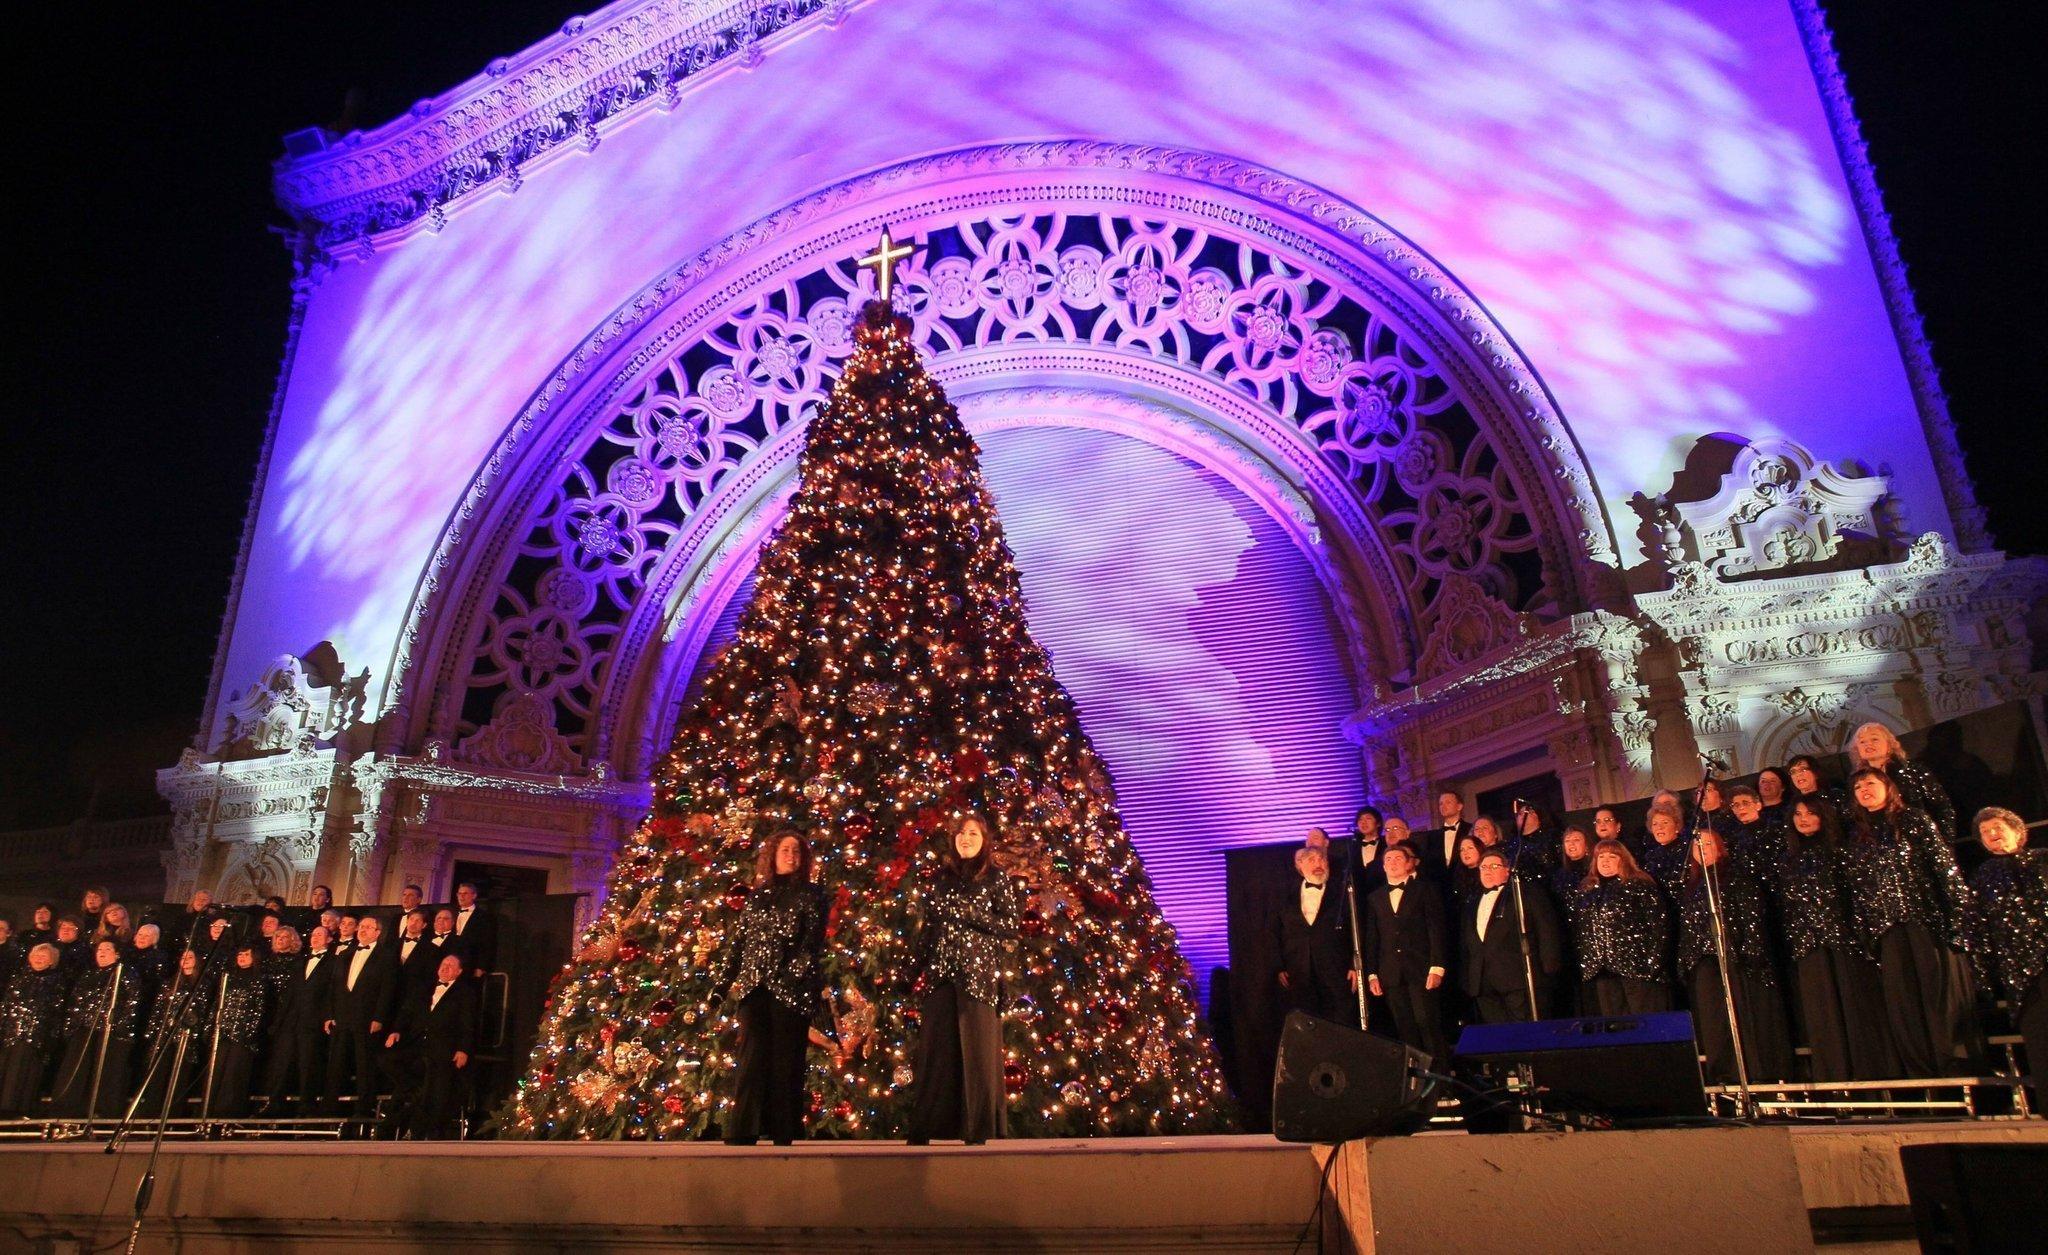 december nights to light up balboa park the san diego union tribune - Balboa Park Christmas Lights